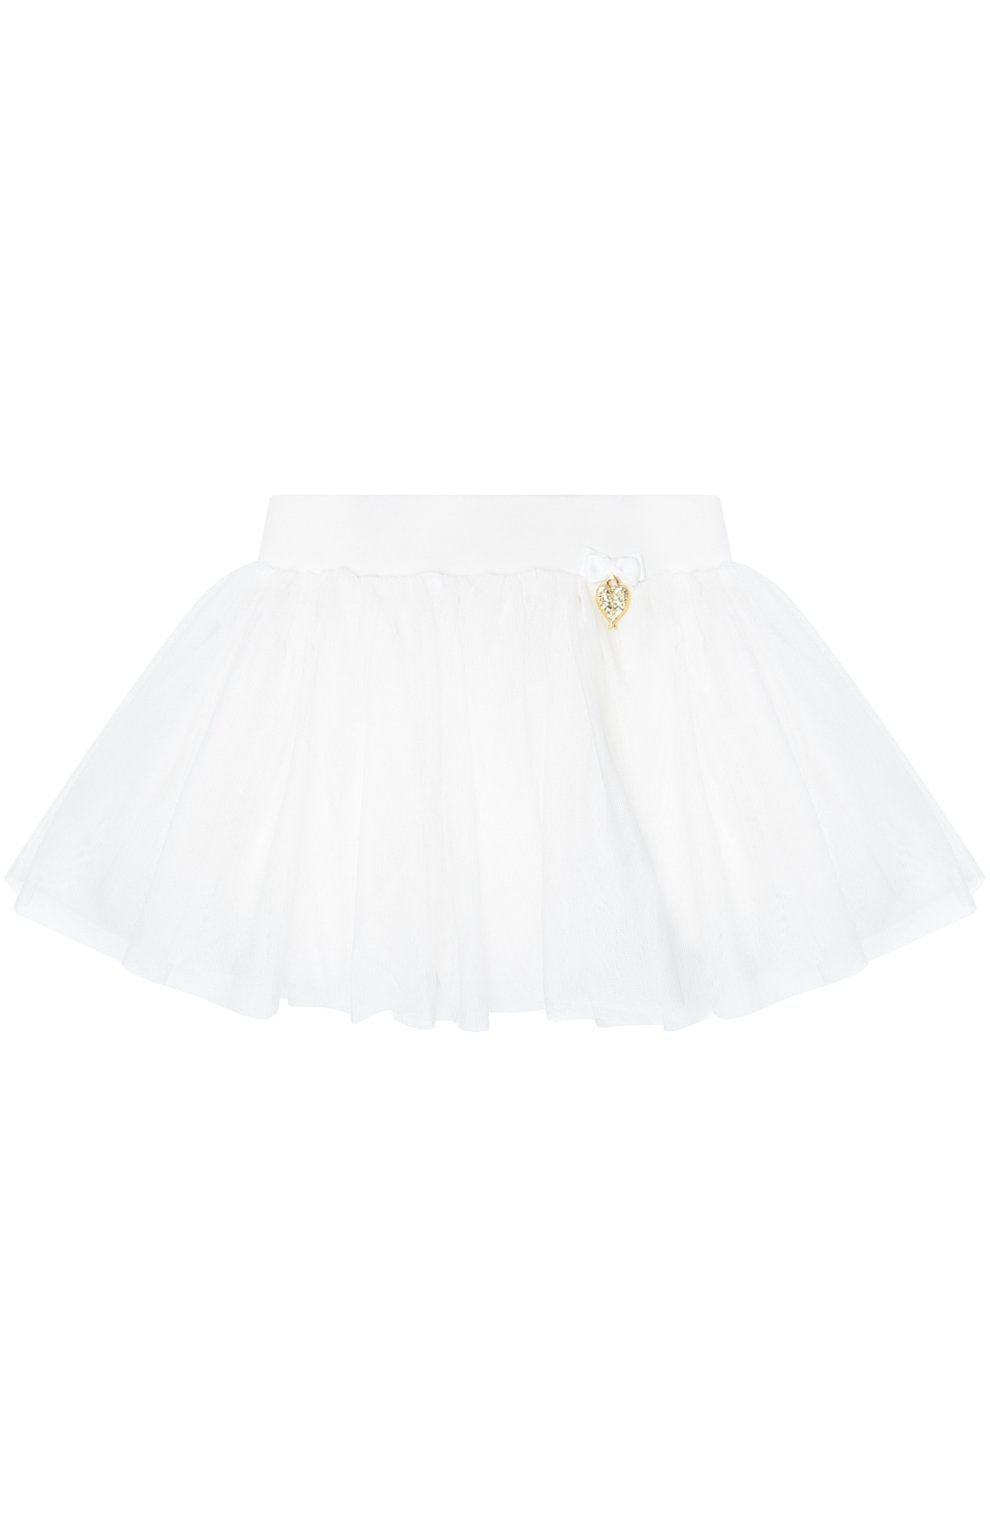 Пышная многоярусная юбка   Фото №1